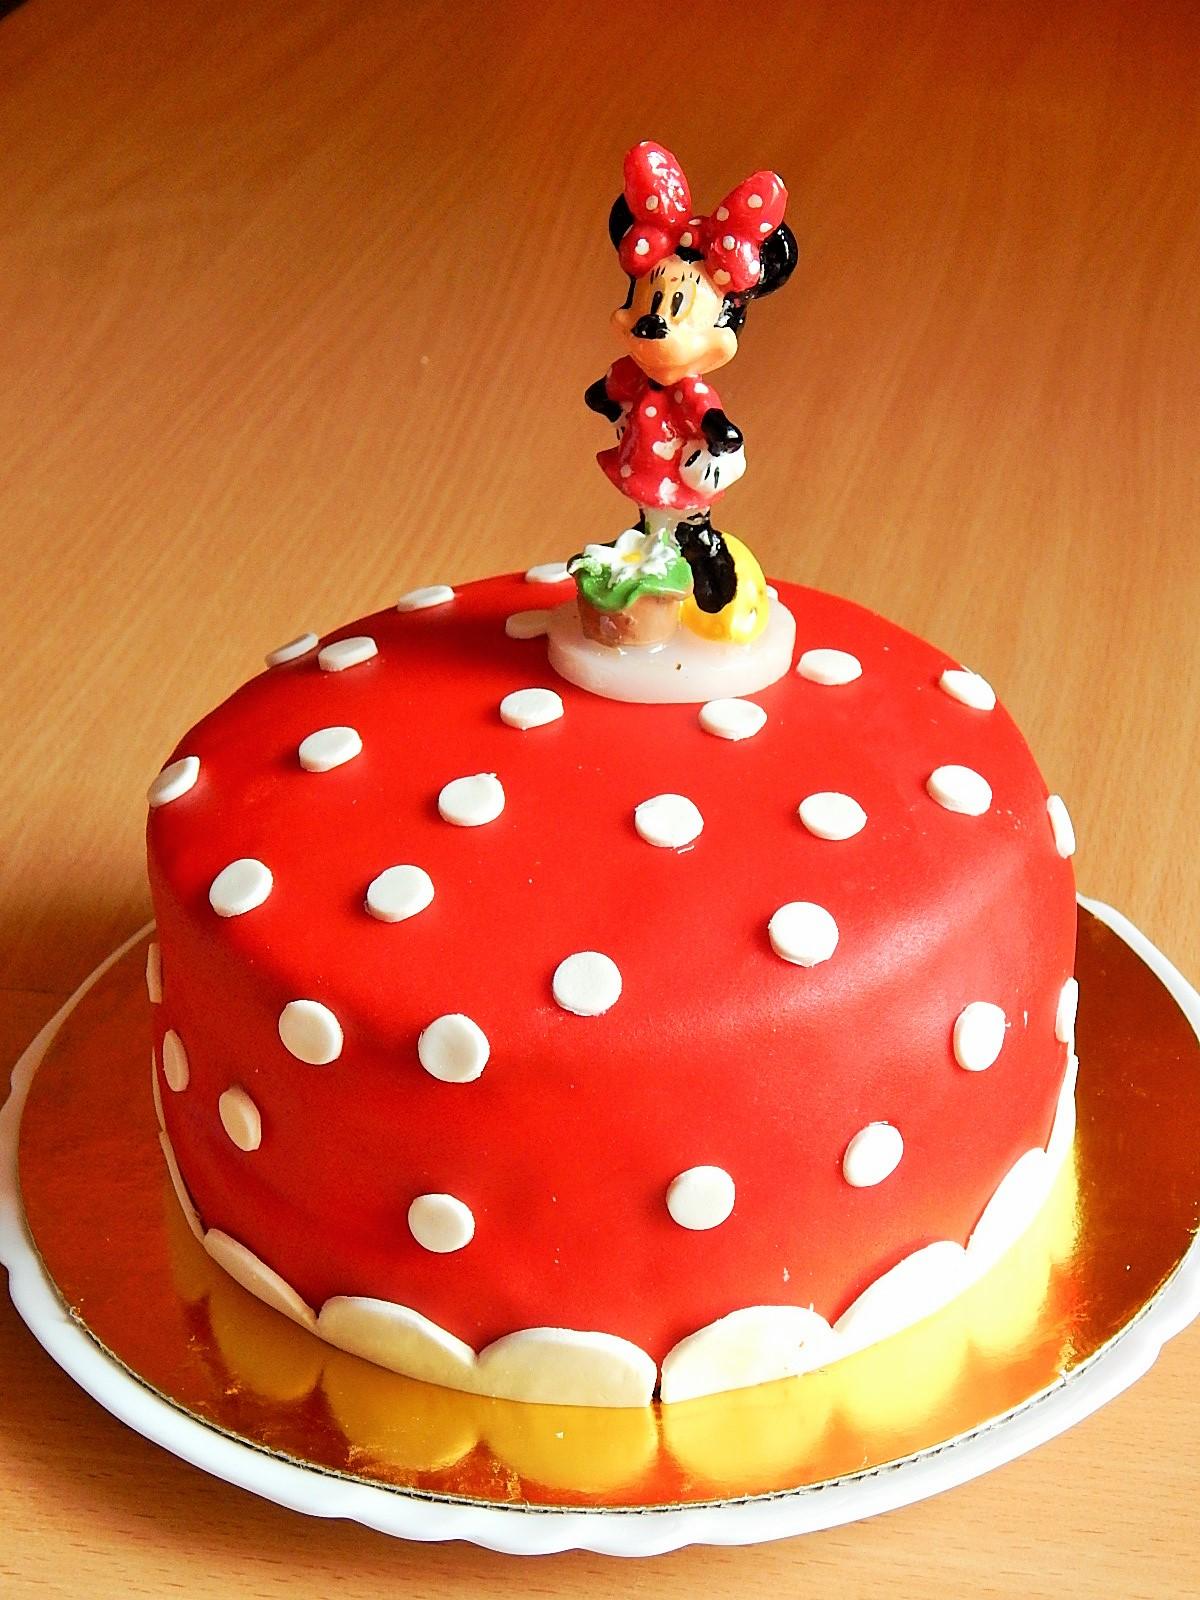 minnie egér torta képek minnie egeres torta   Tortareceptek minnie egér torta képek